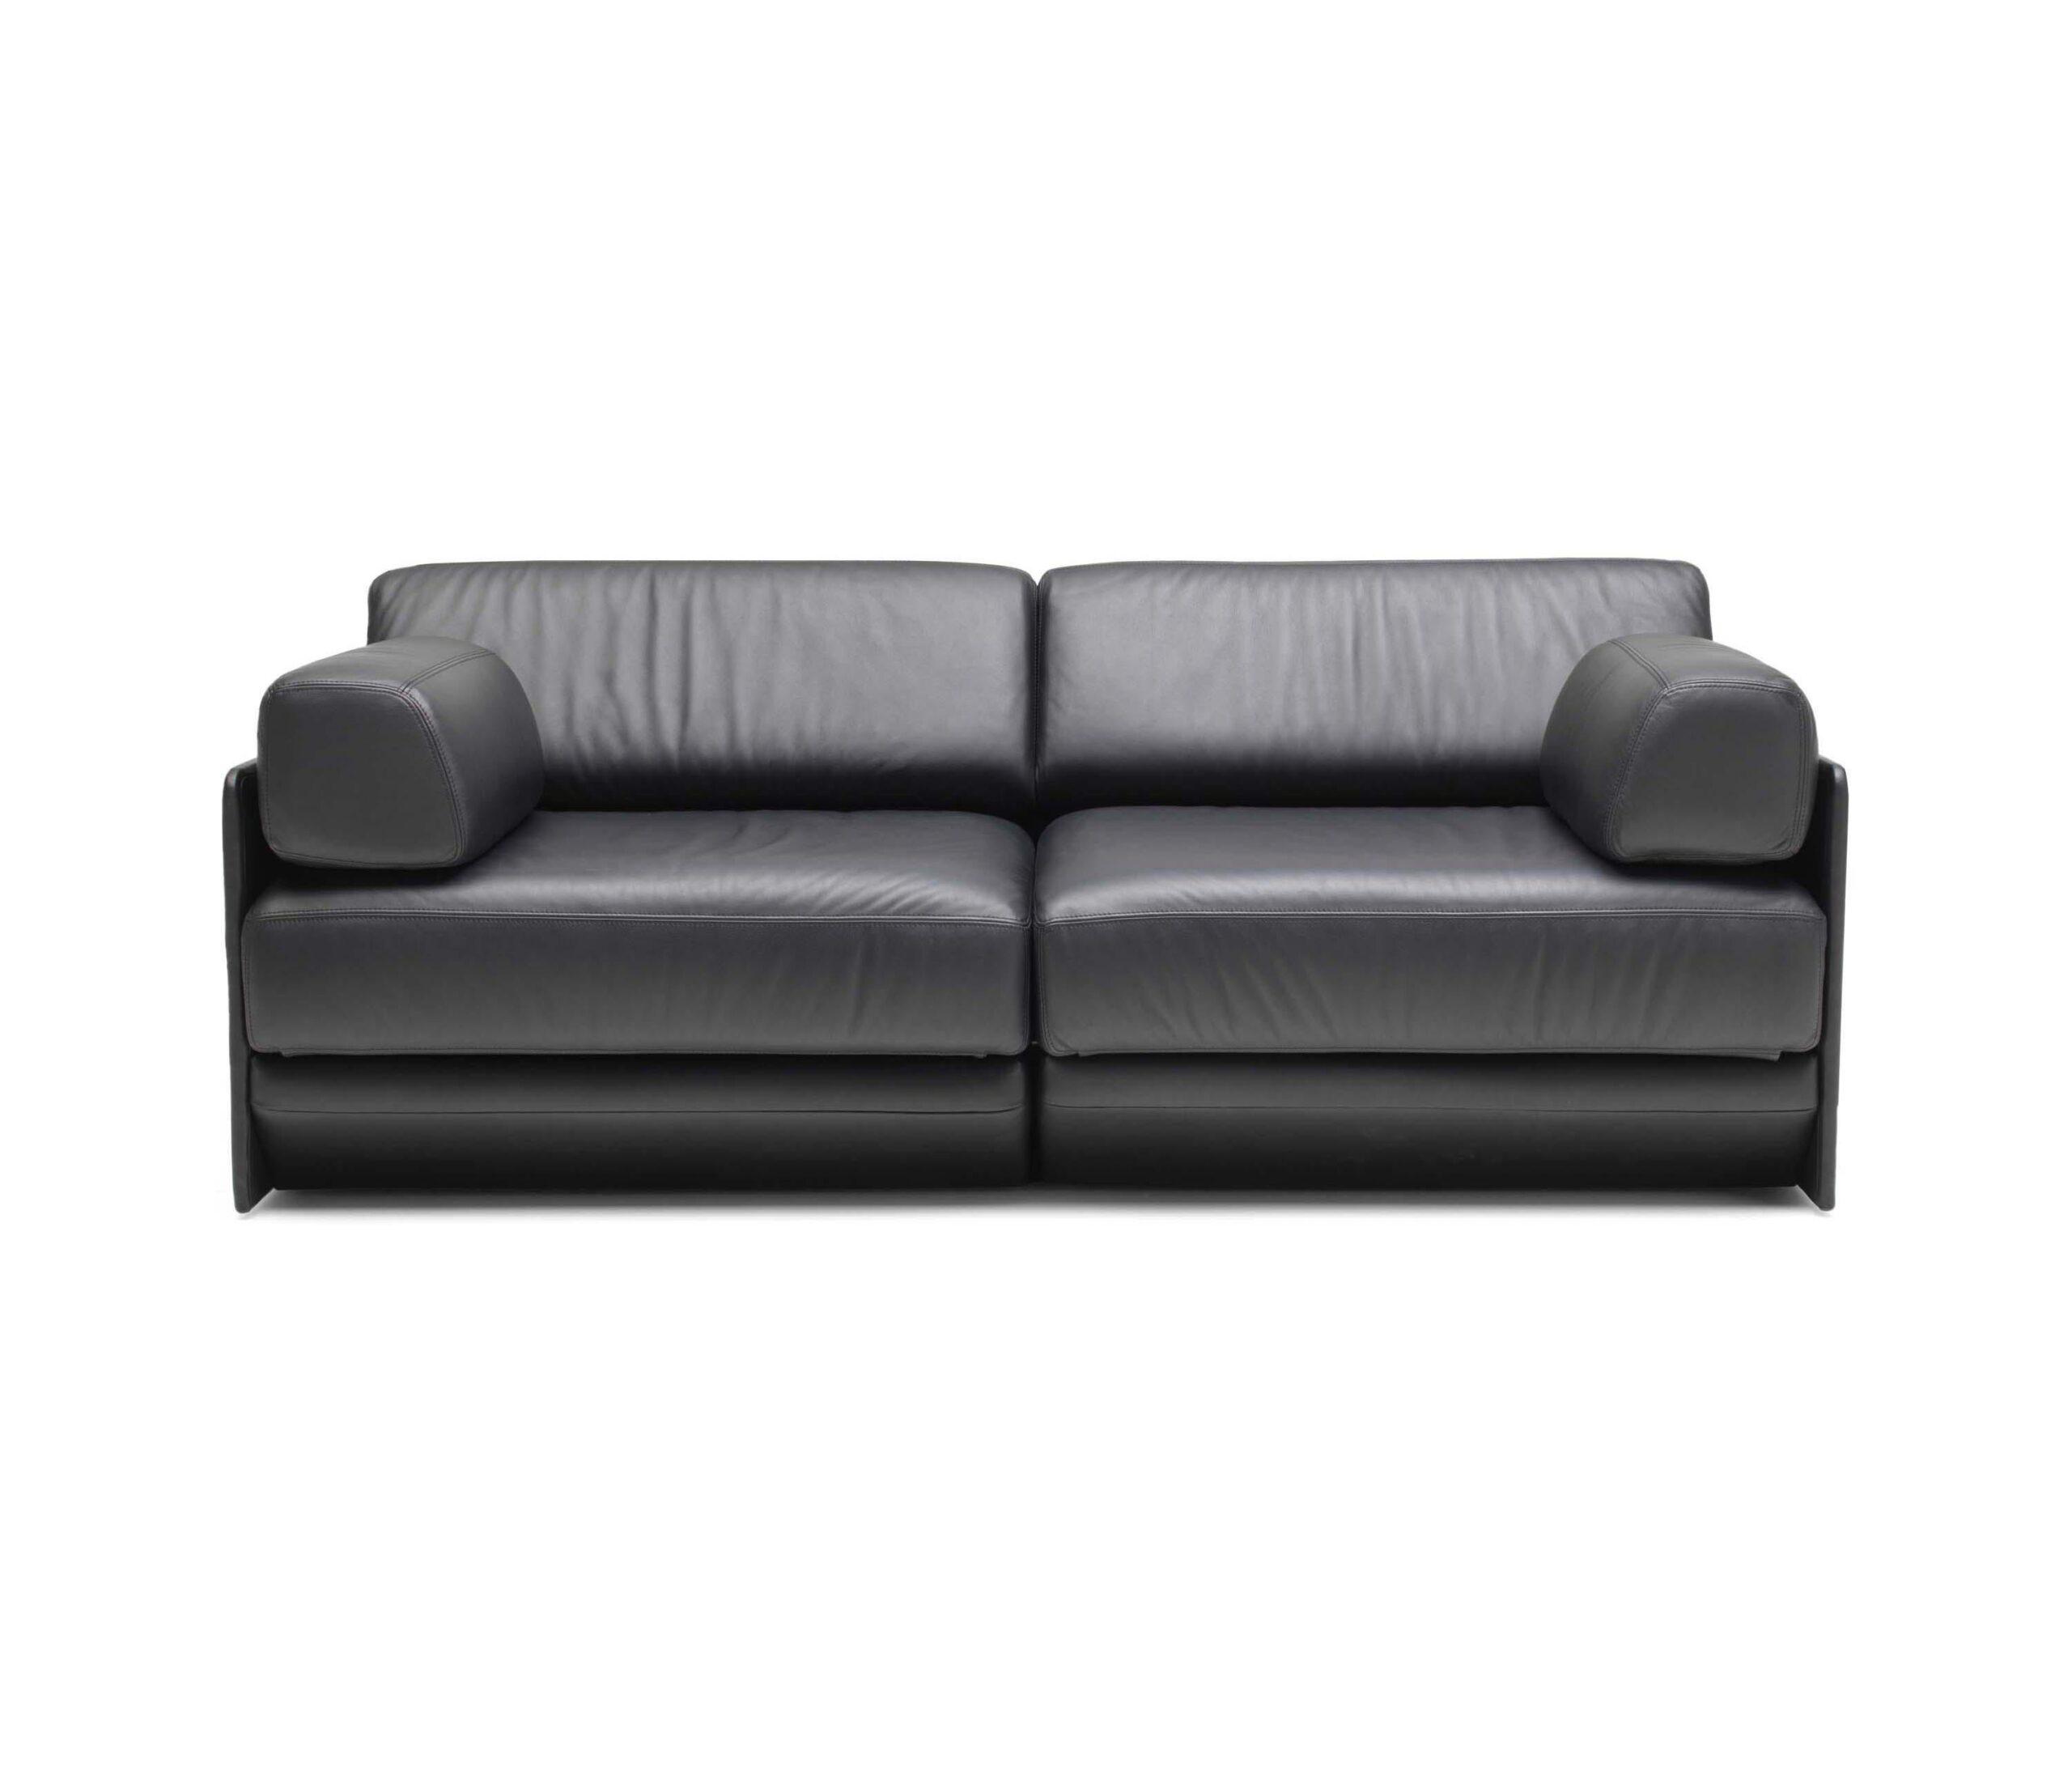 Full Size of De Sede Sofa Bed Preis Furniture Gebraucht Sleeper Couch Sessel Preise For Sale Preisliste Endless Ds 600 By Bi Usa Halbrundes Grau Stoff Spielgeräte Für Den Sofa De Sede Sofa